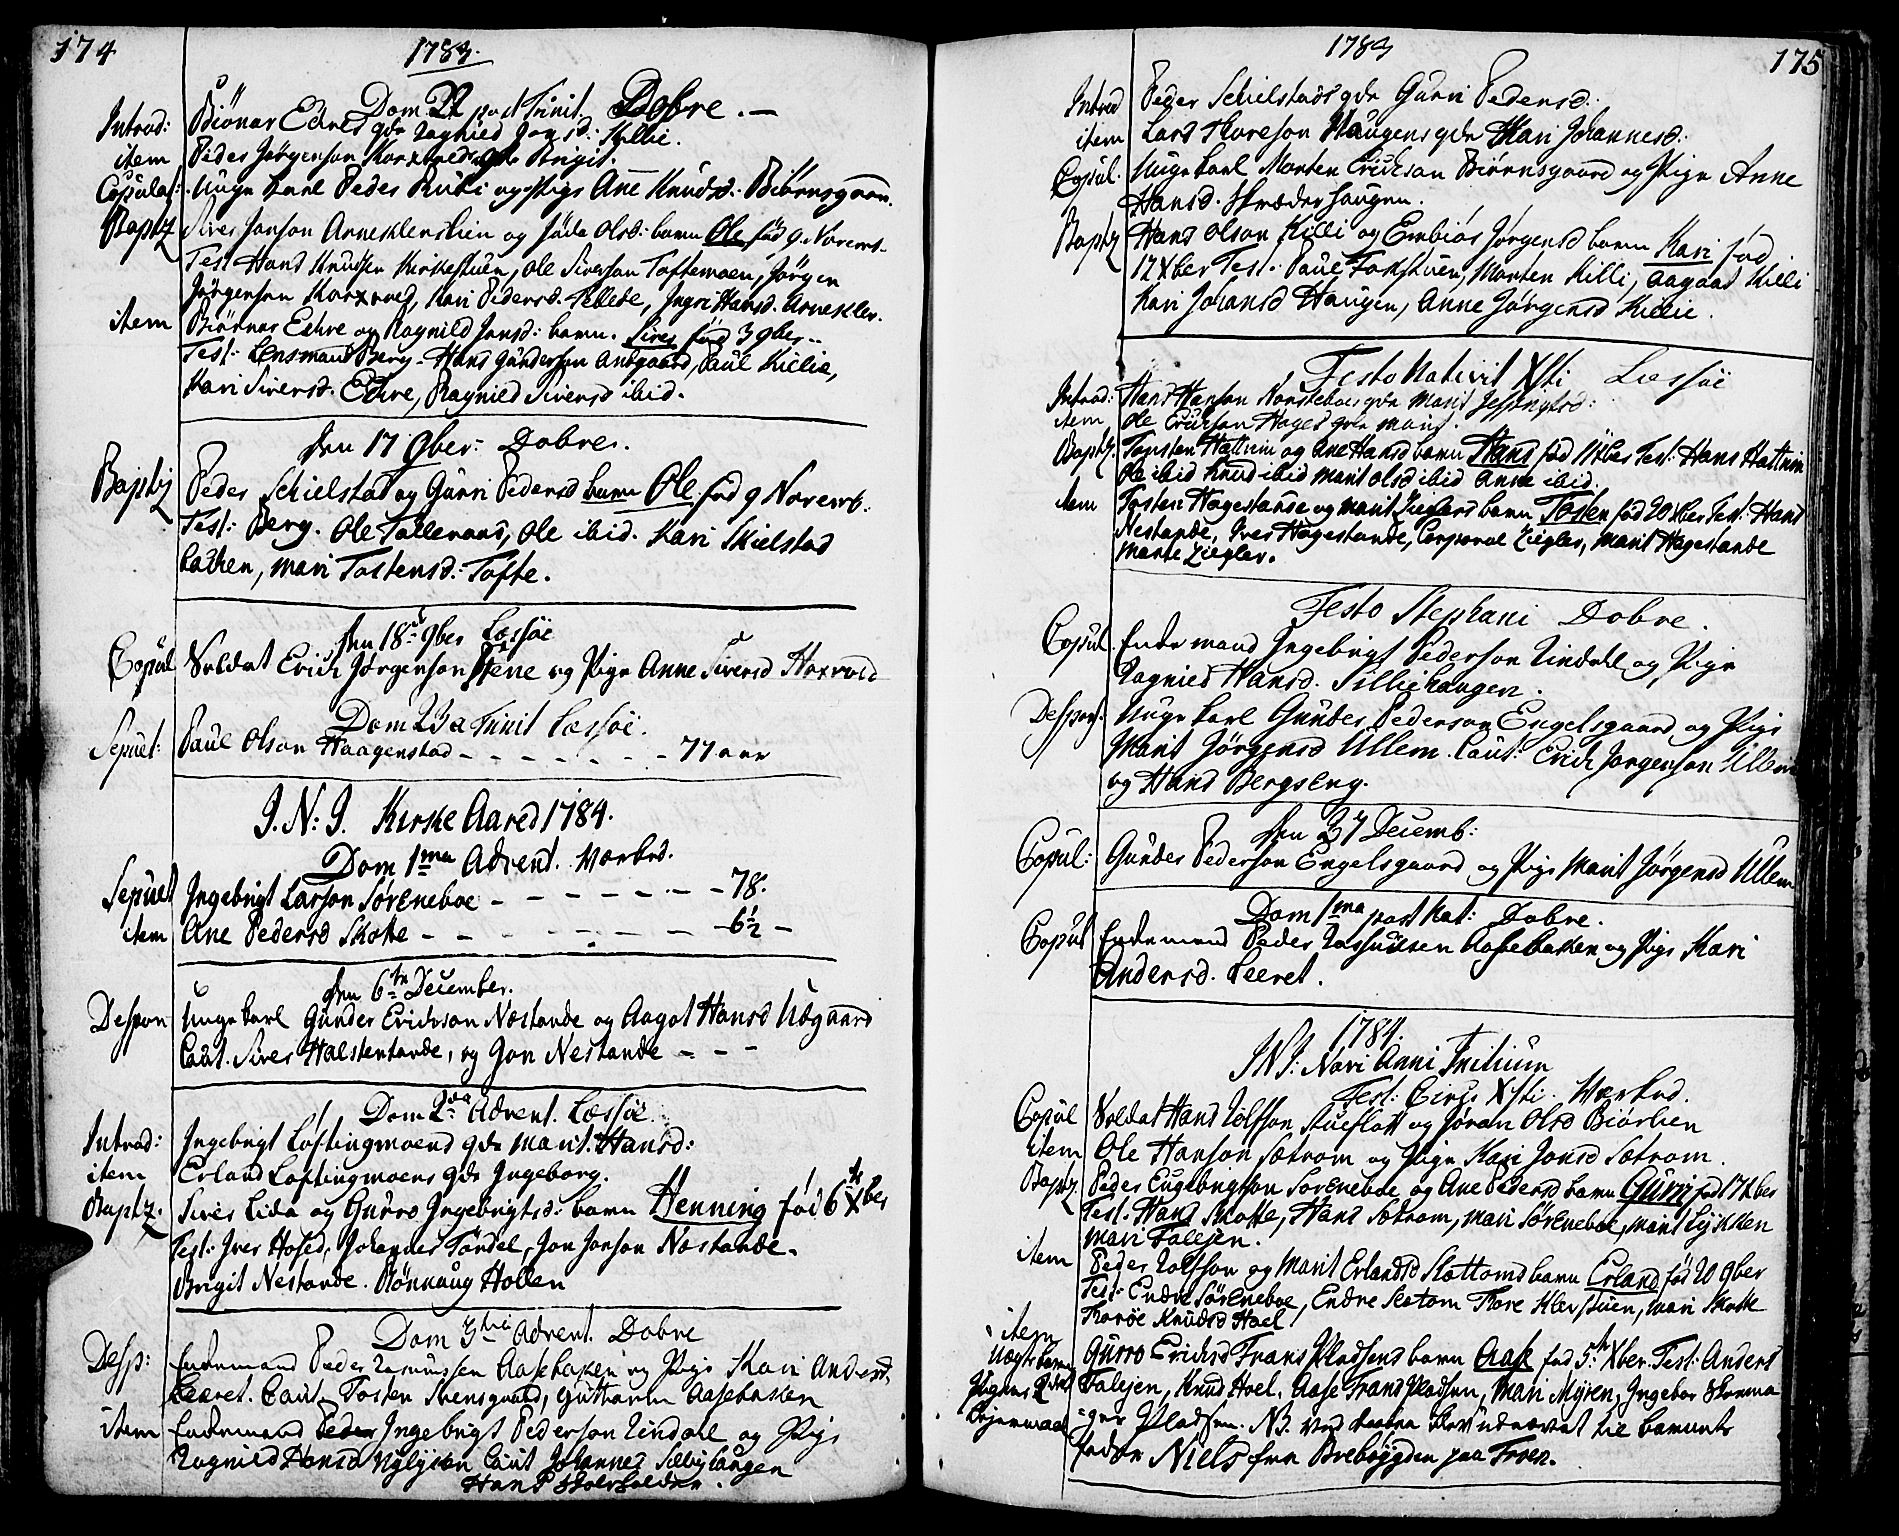 SAH, Lesja prestekontor, Ministerialbok nr. 3, 1777-1819, s. 174-175